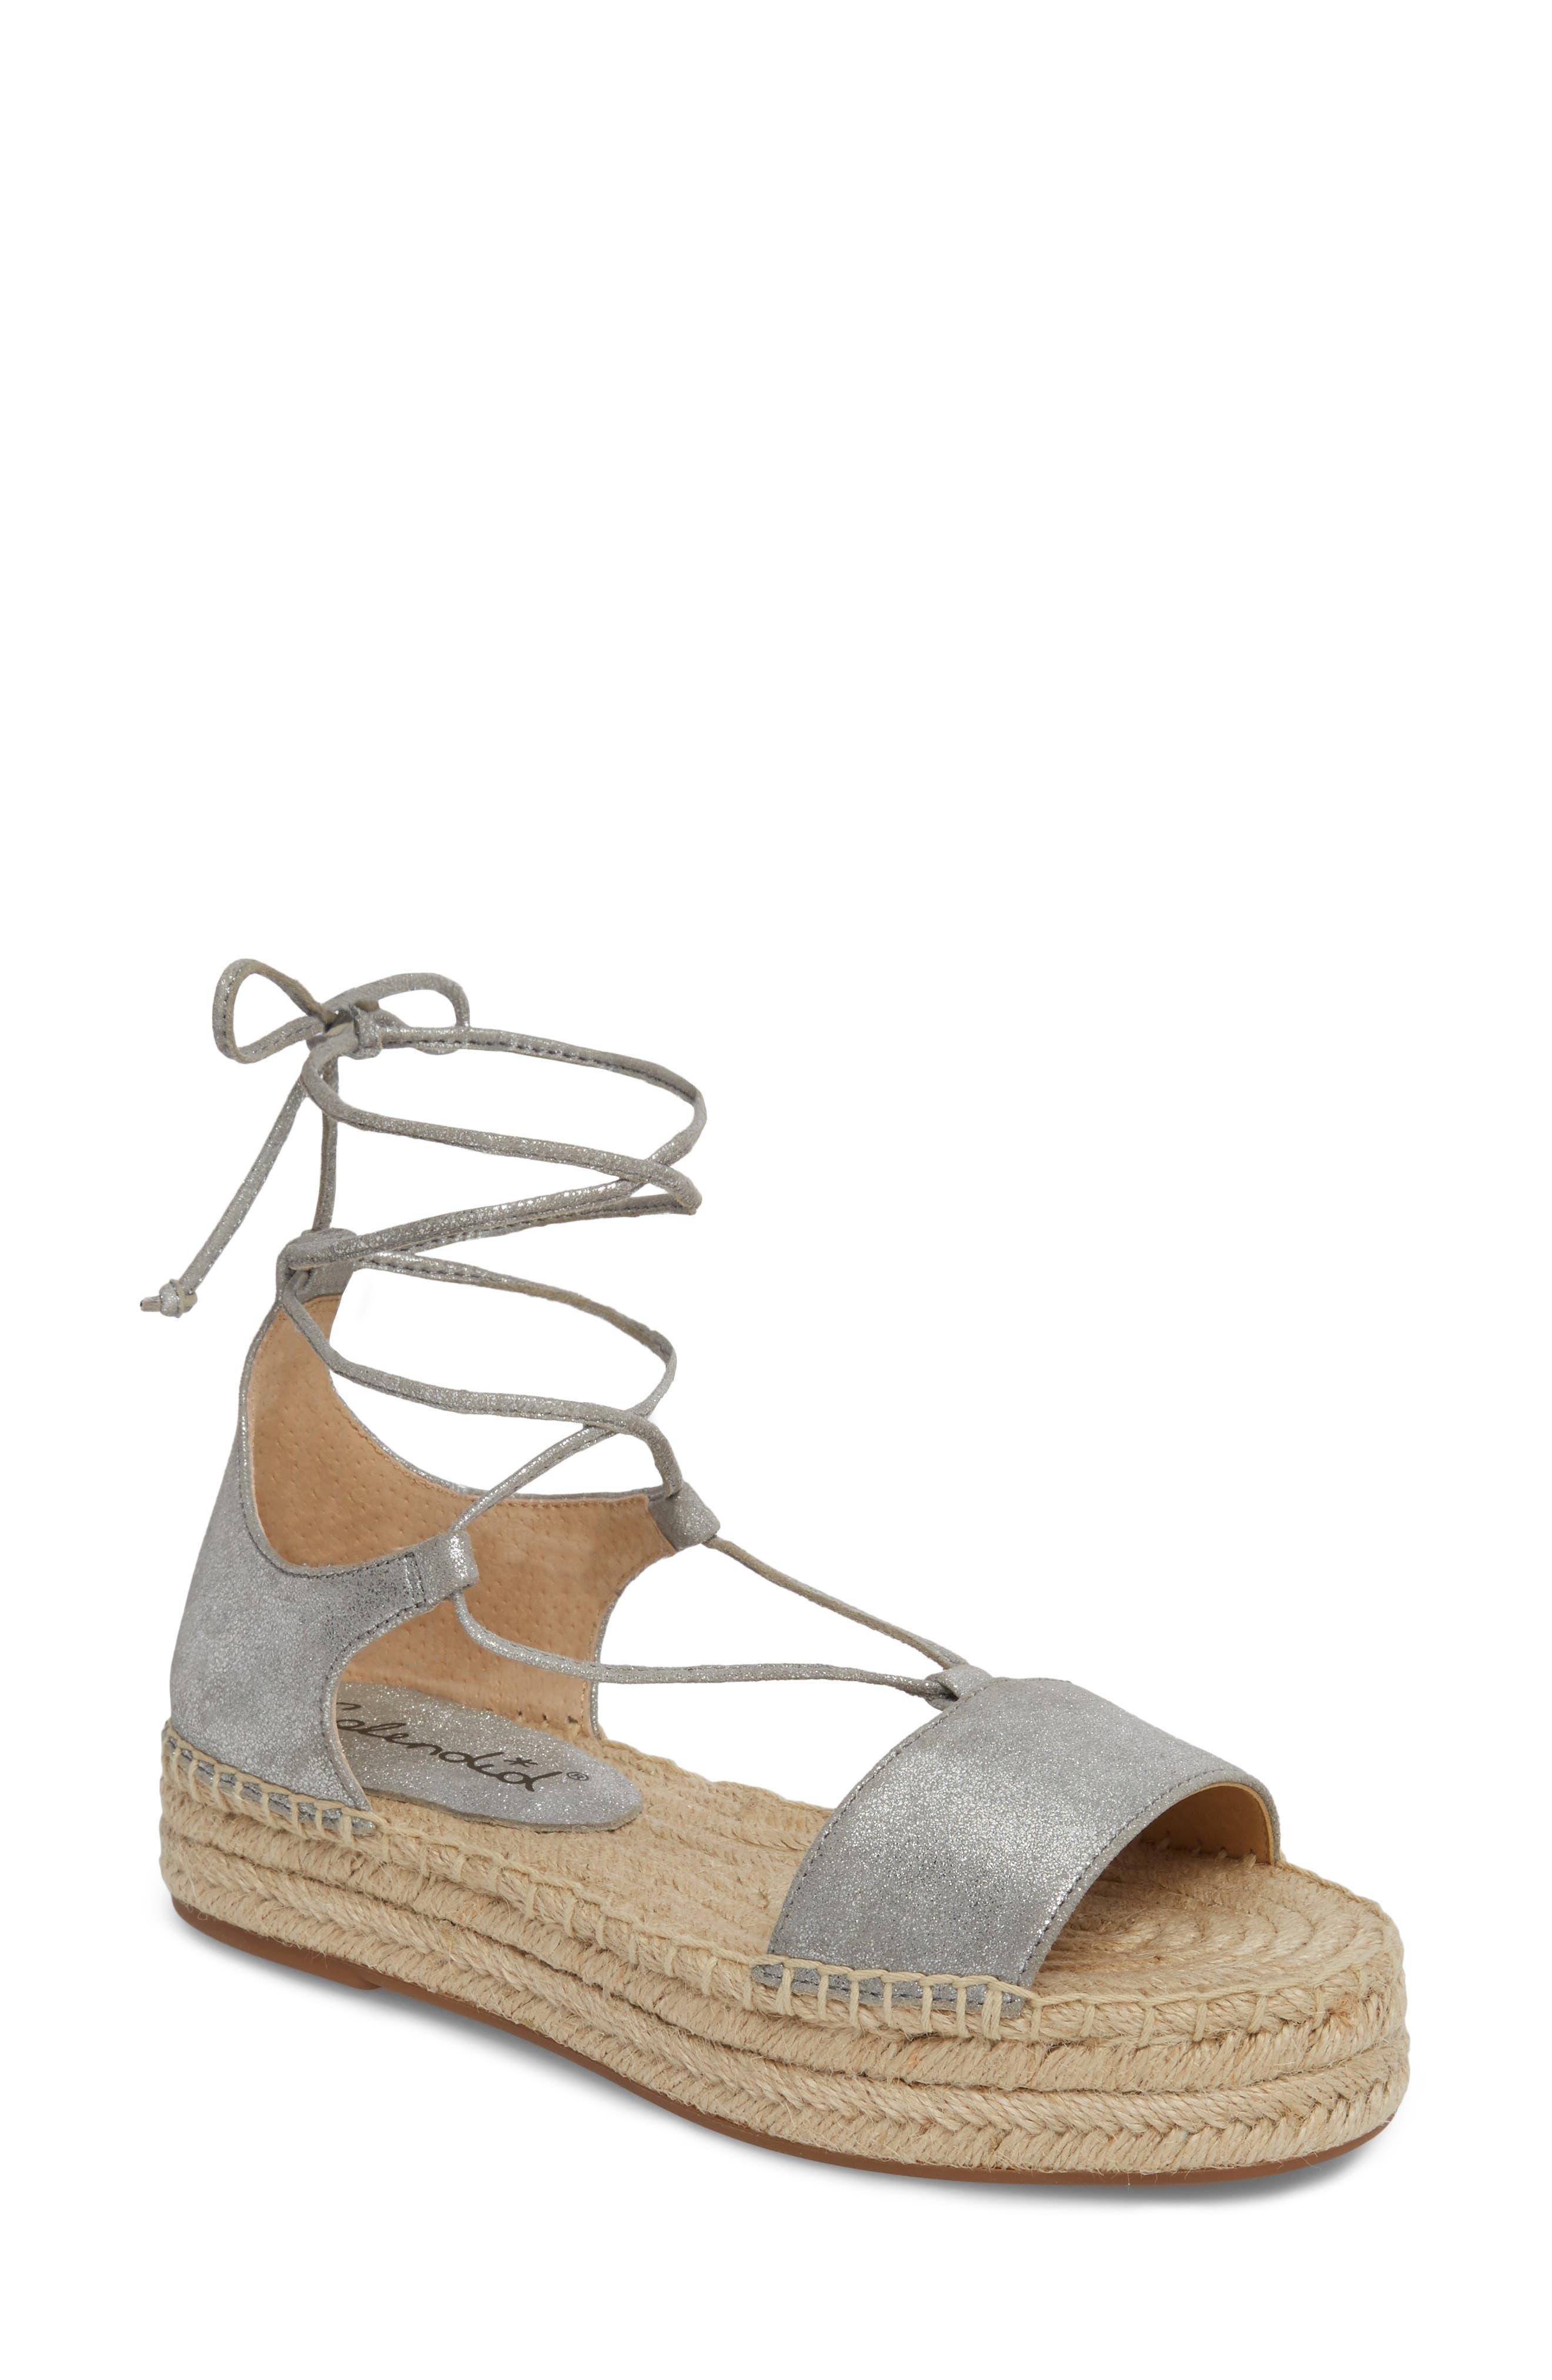 Fernanda Wraparound Platform Sandal,                             Main thumbnail 1, color,                             SILVER SUEDE